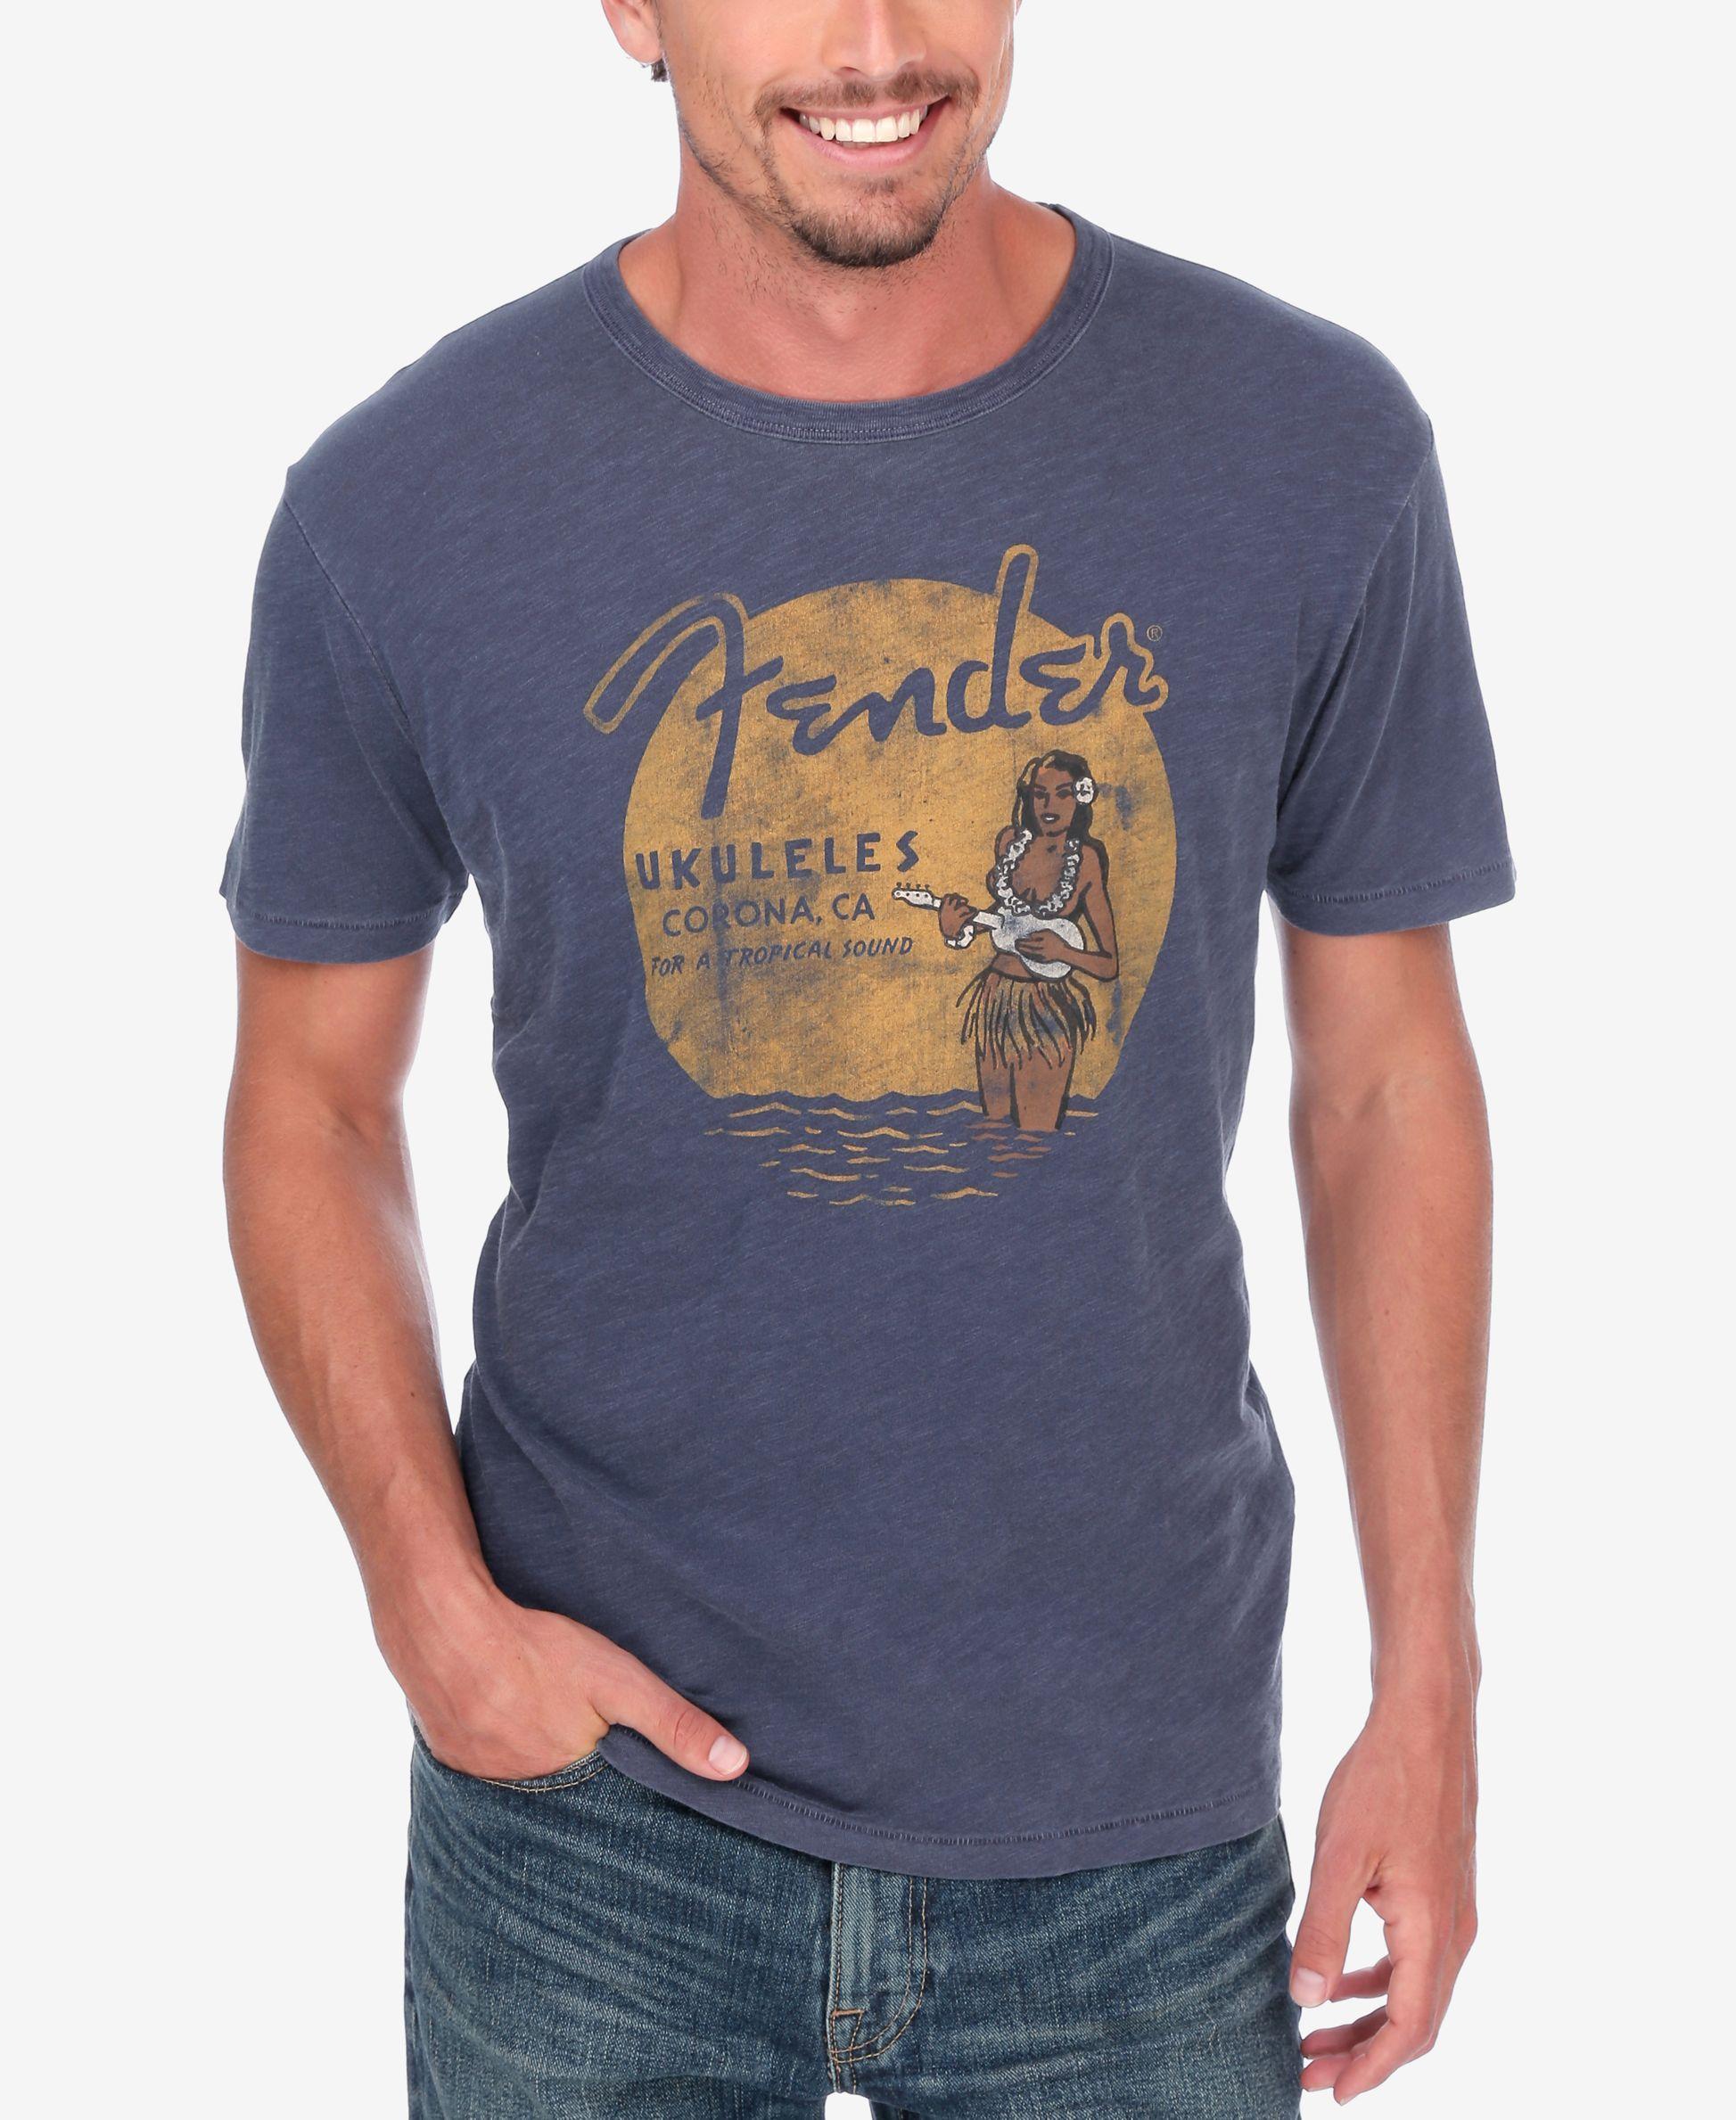 ab3db0f21 Lucky Brand Men's Fender Ukulele/Hula T-Shirt   Vintage Hawaii   Men ...